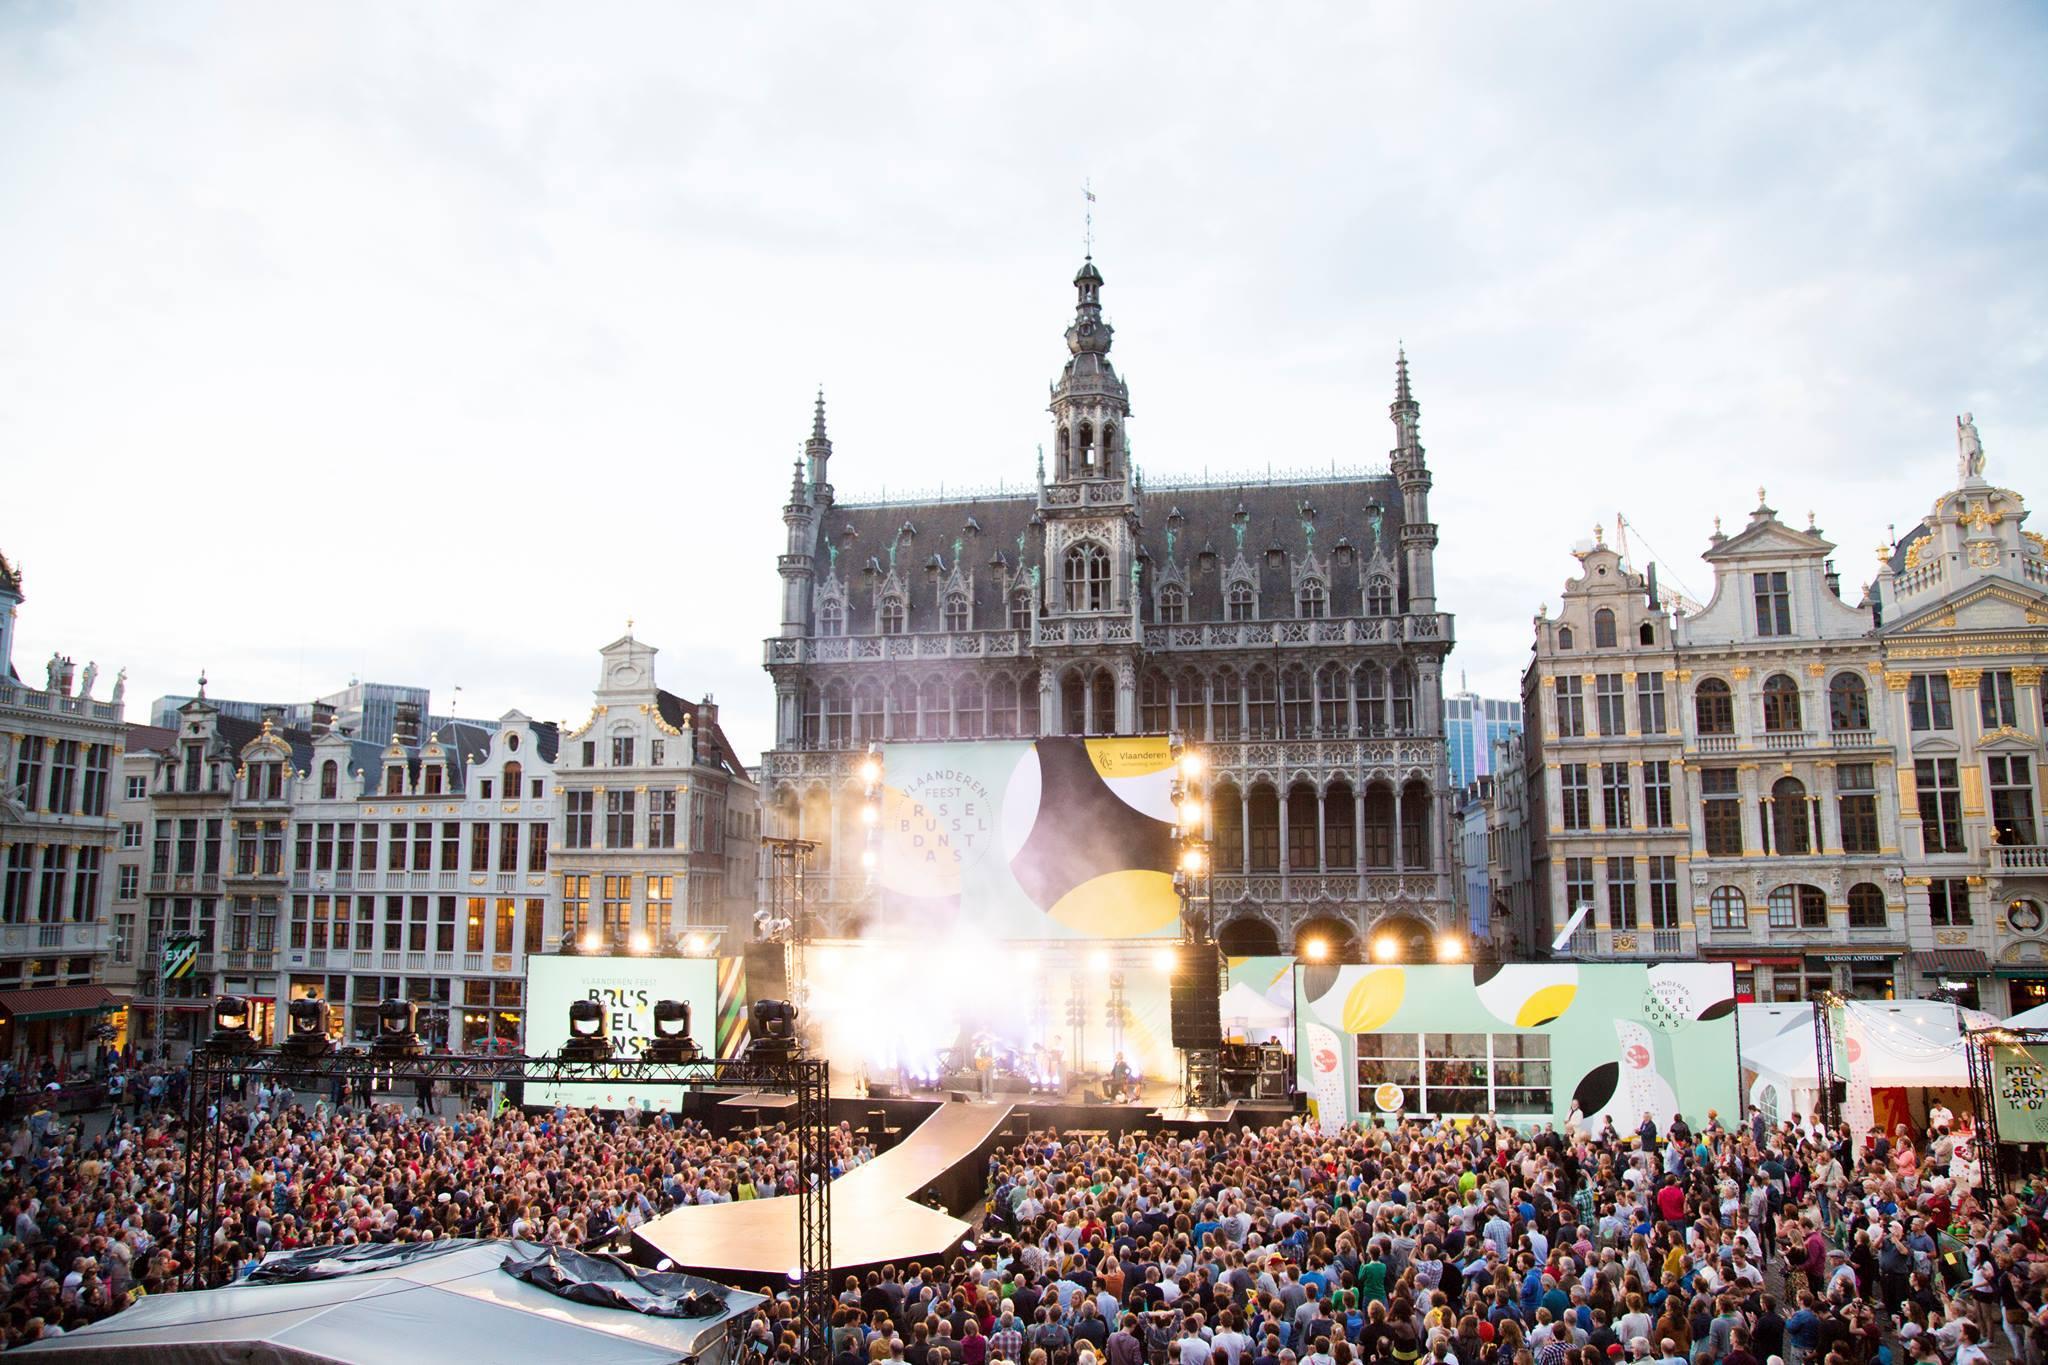 Brussel Danst 2016